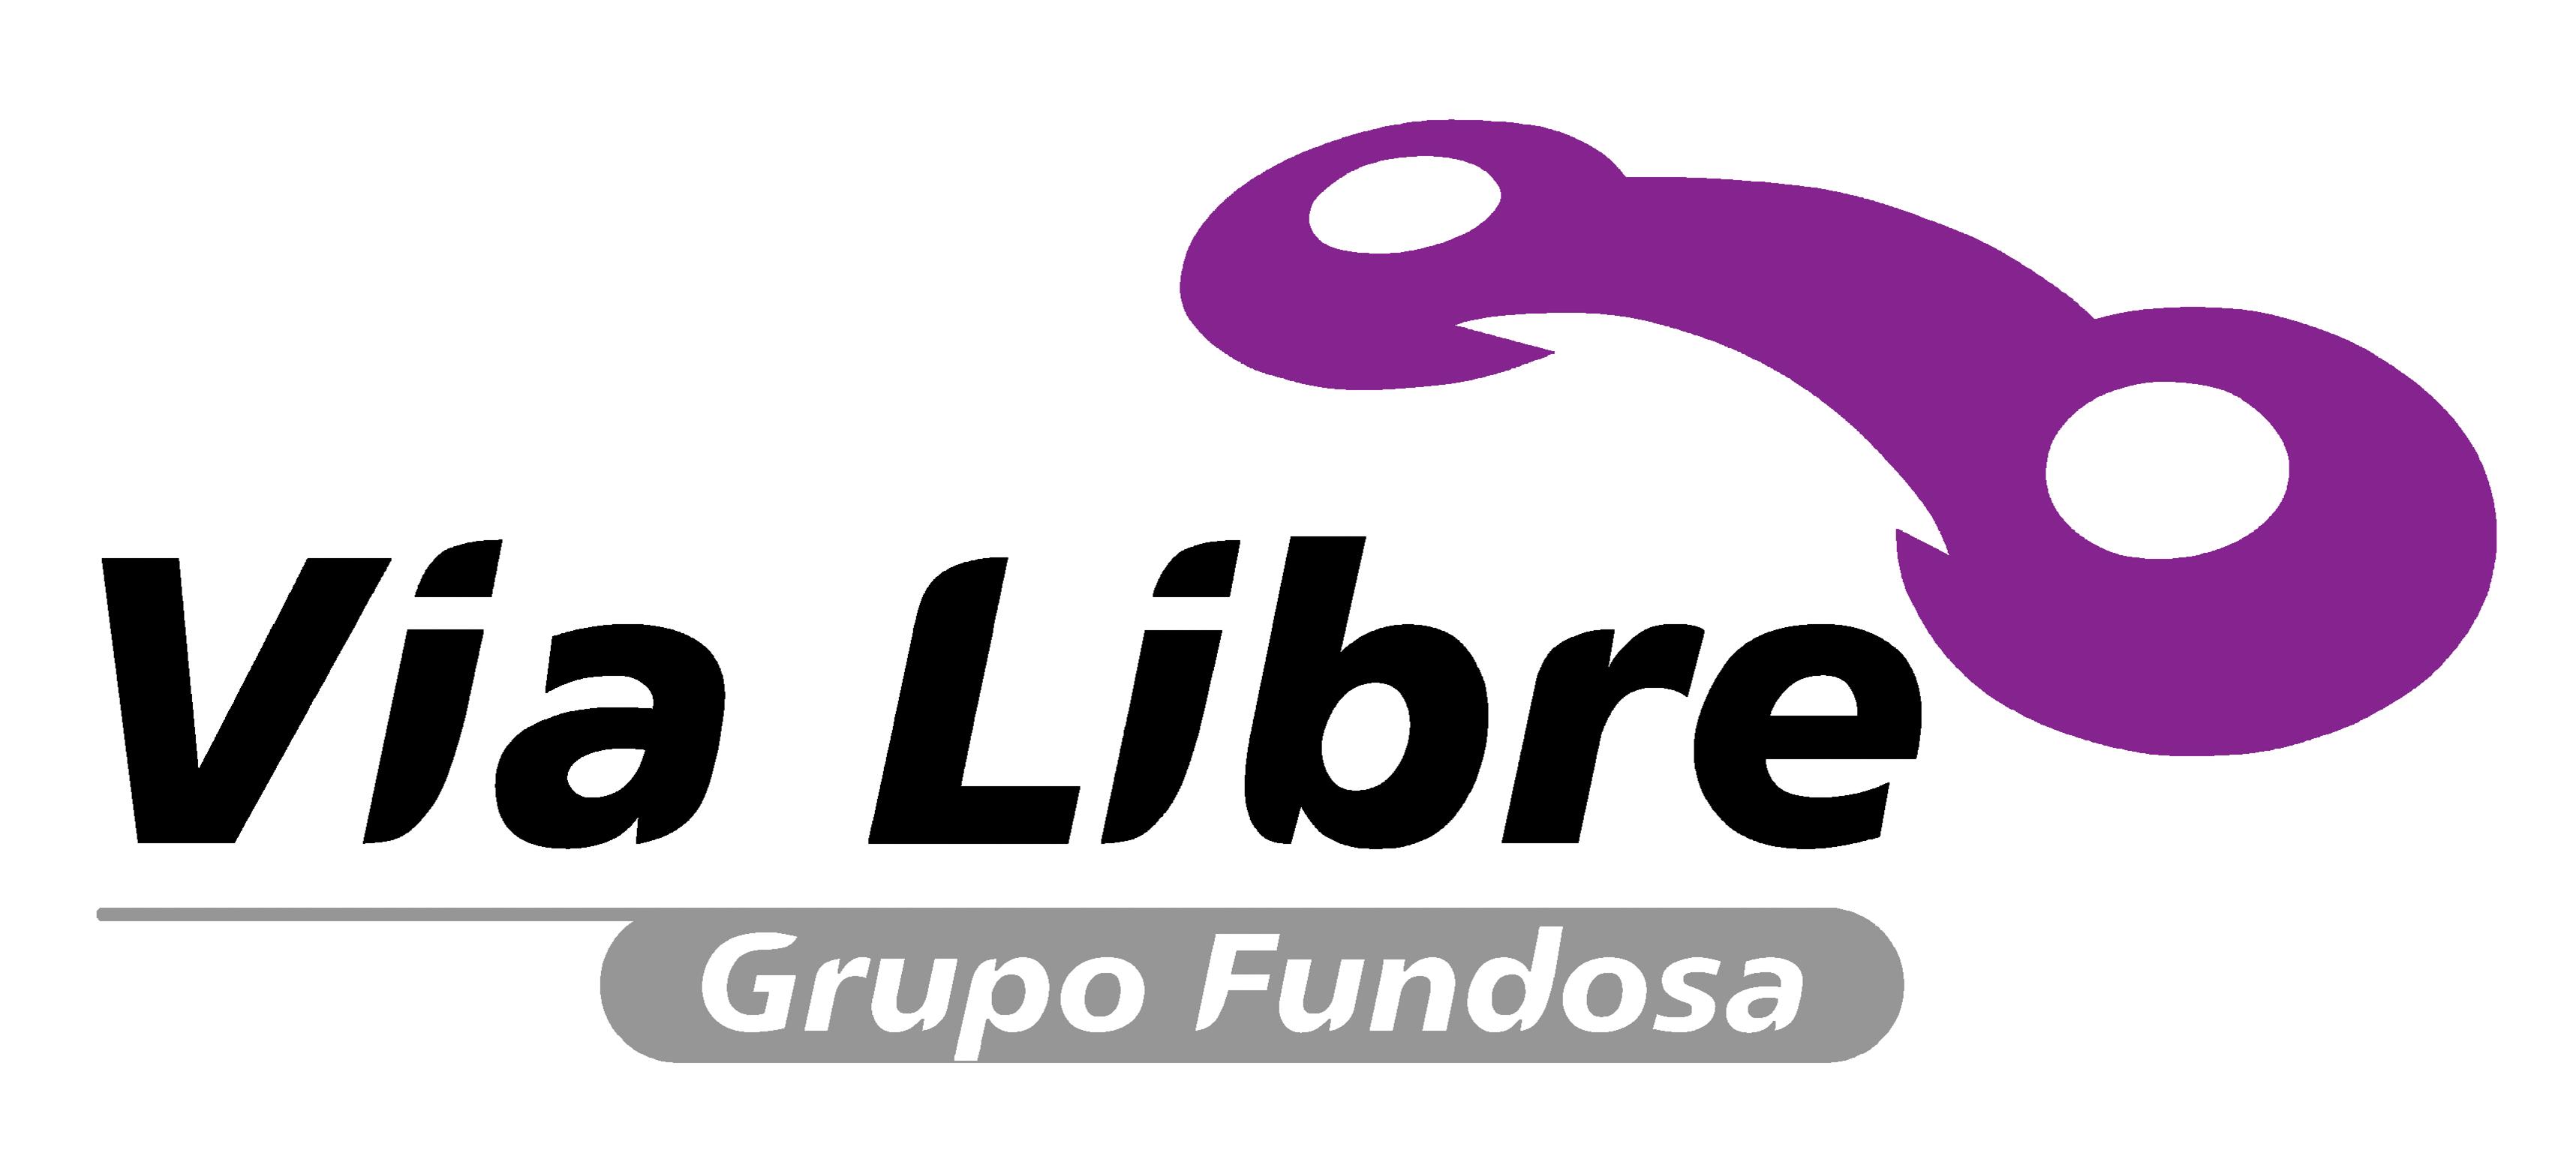 Via libre logo